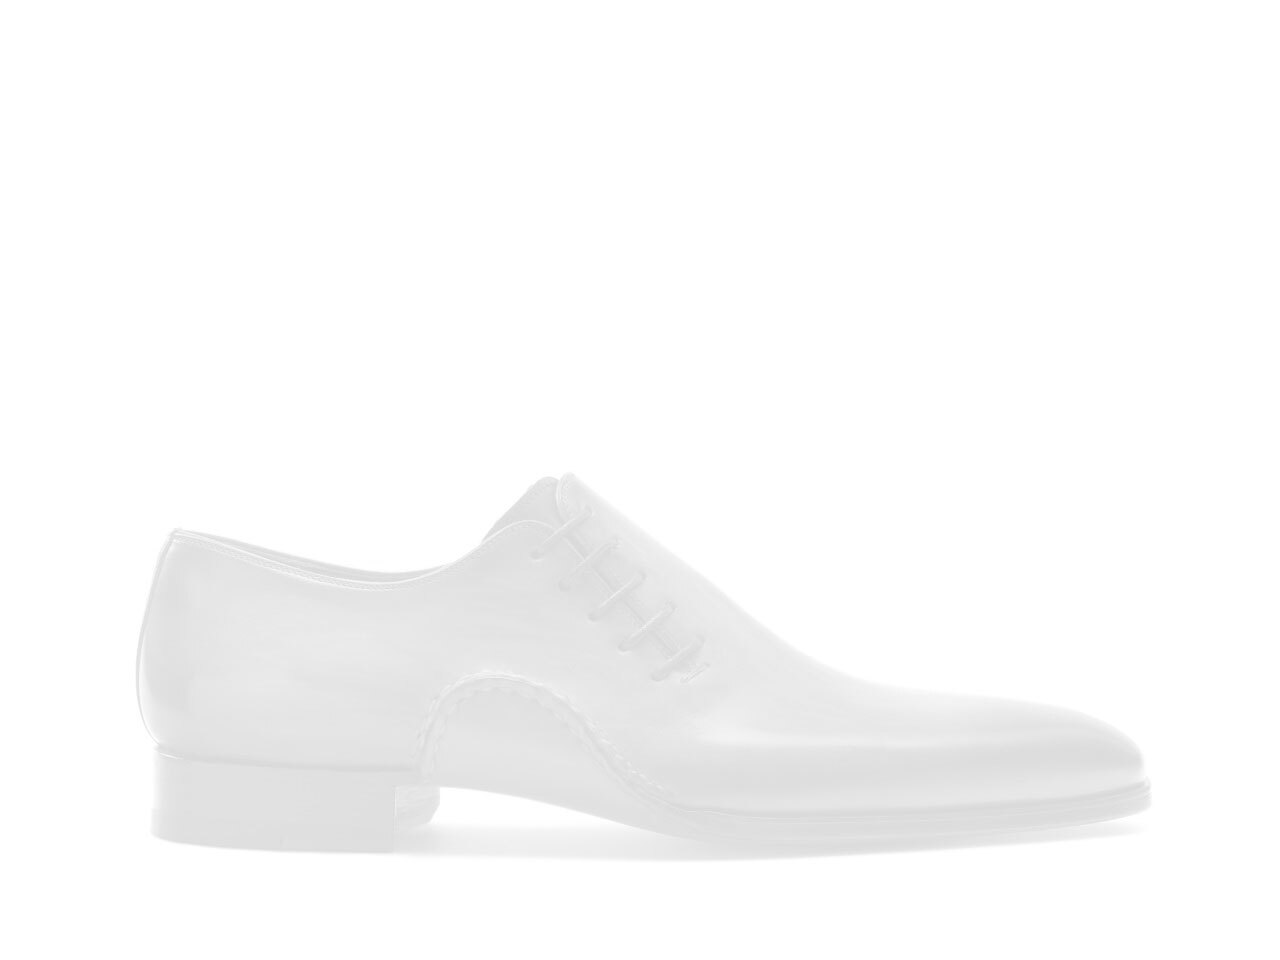 Pair of the Magnanni Ruente Black Men's Sneakers